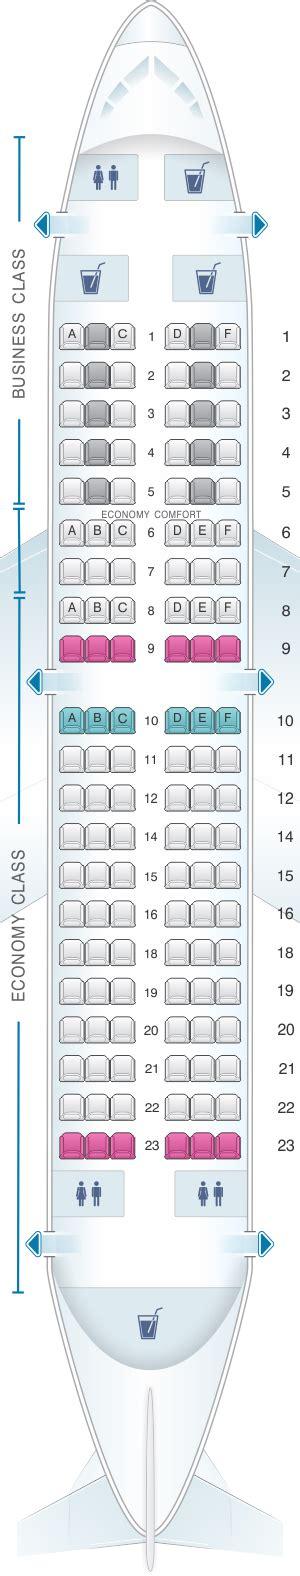 plan de cabine klm boeing b737 700 seatmaestro fr